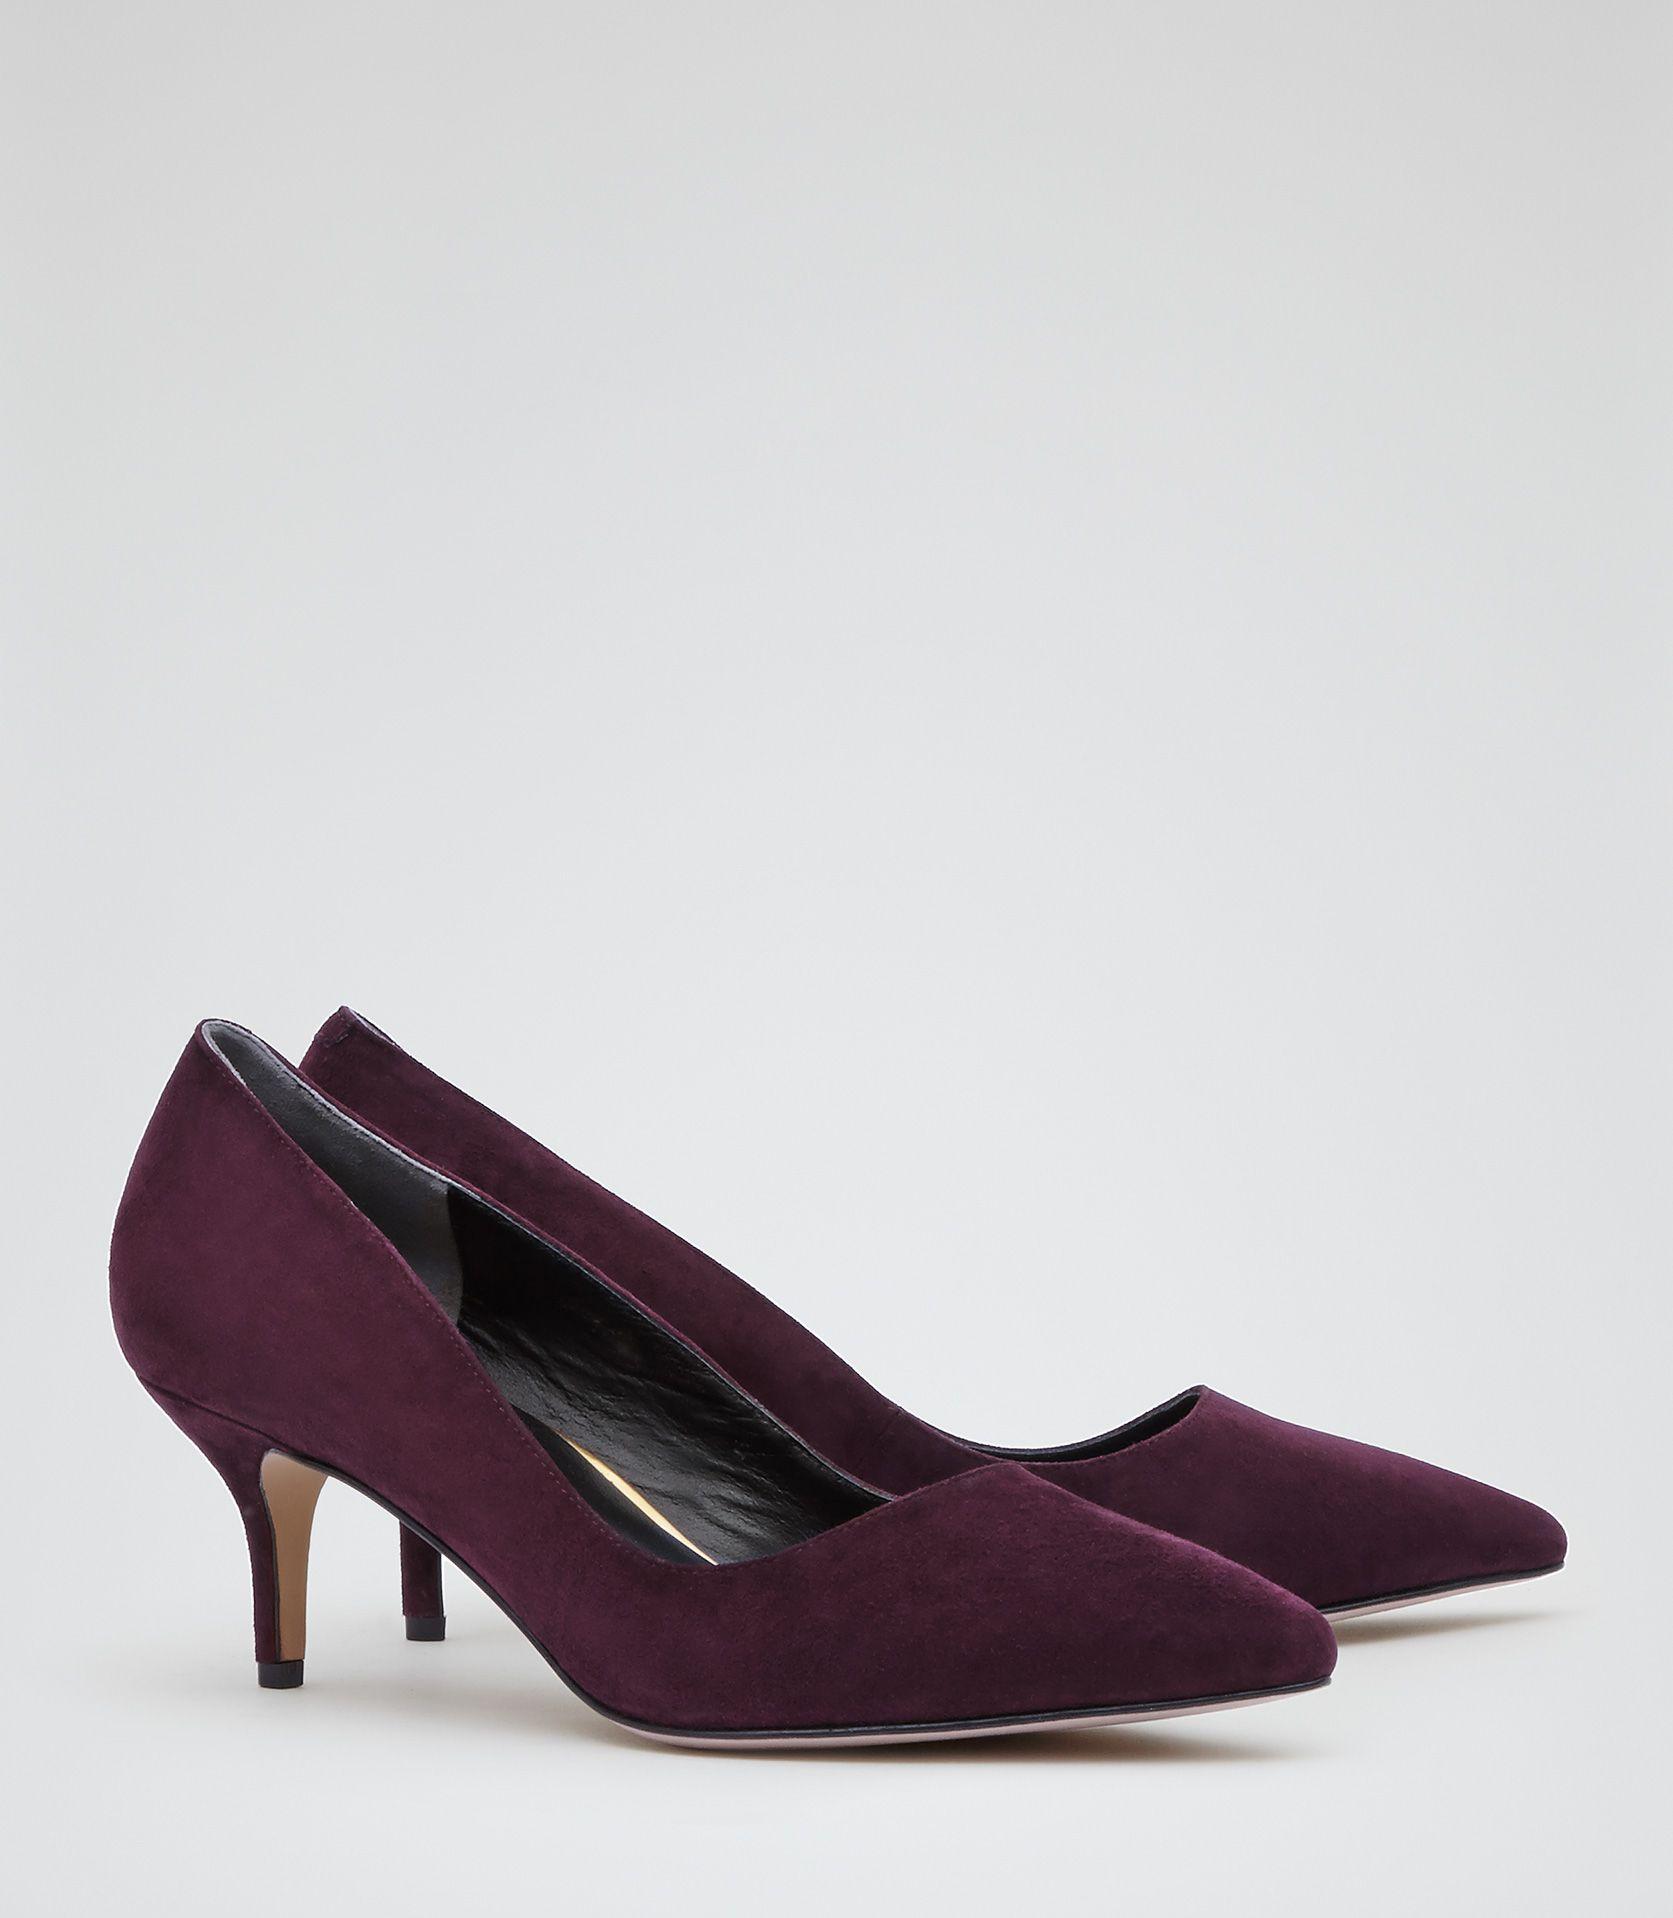 Womens Burgundy Kitten Heel Court Shoes - Reiss Holly | My work ...